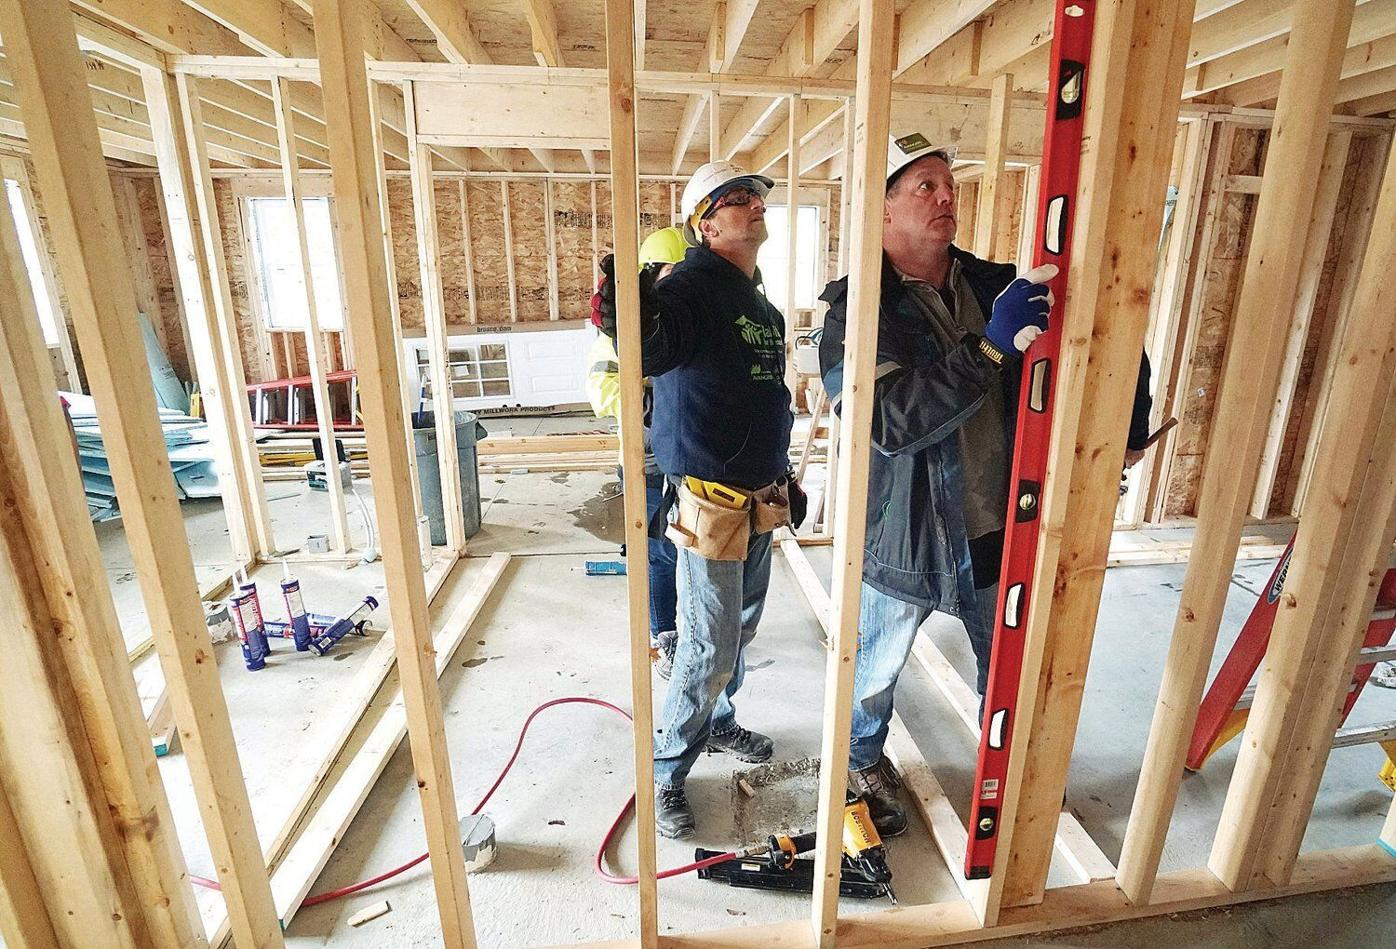 Berkshire Gas, Wayfair lend a hand on Habitat project in Pittsfield